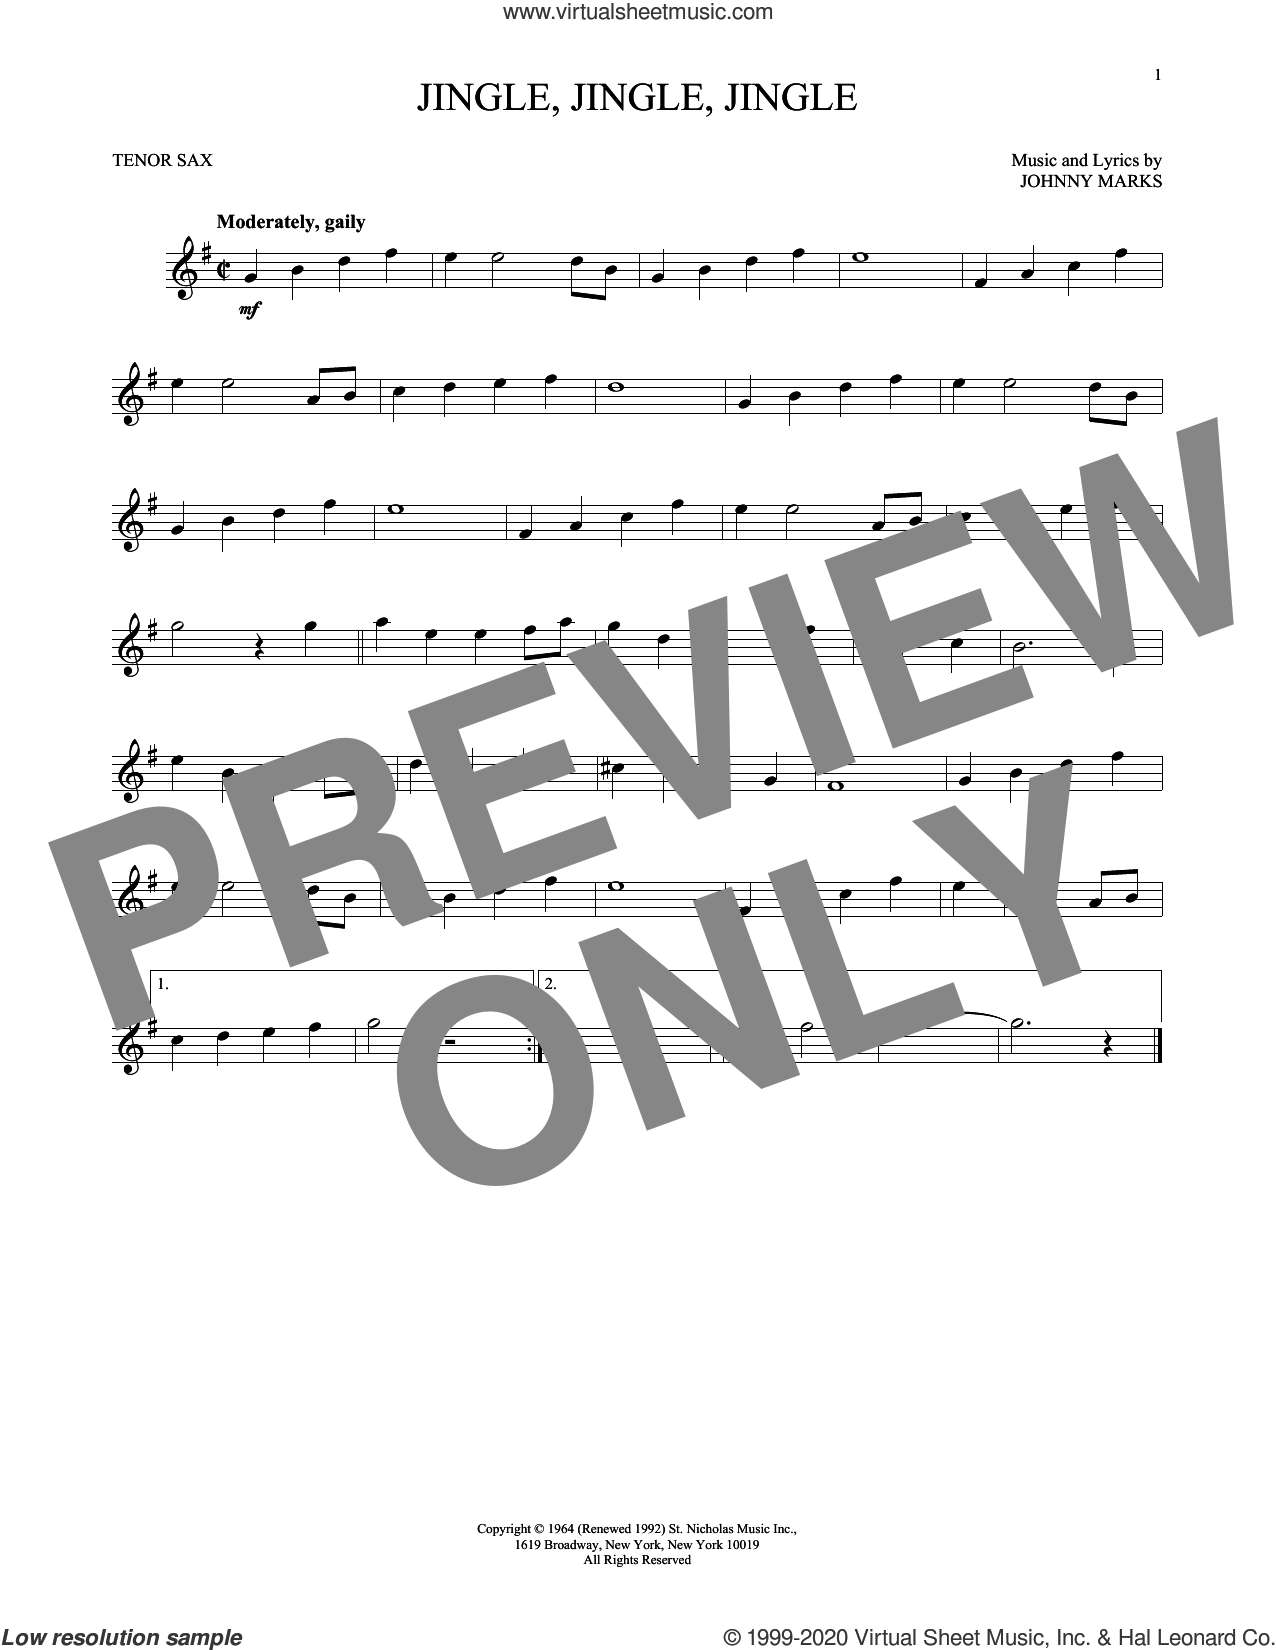 Jingle, Jingle, Jingle sheet music for tenor saxophone solo by Johnny Marks, intermediate skill level